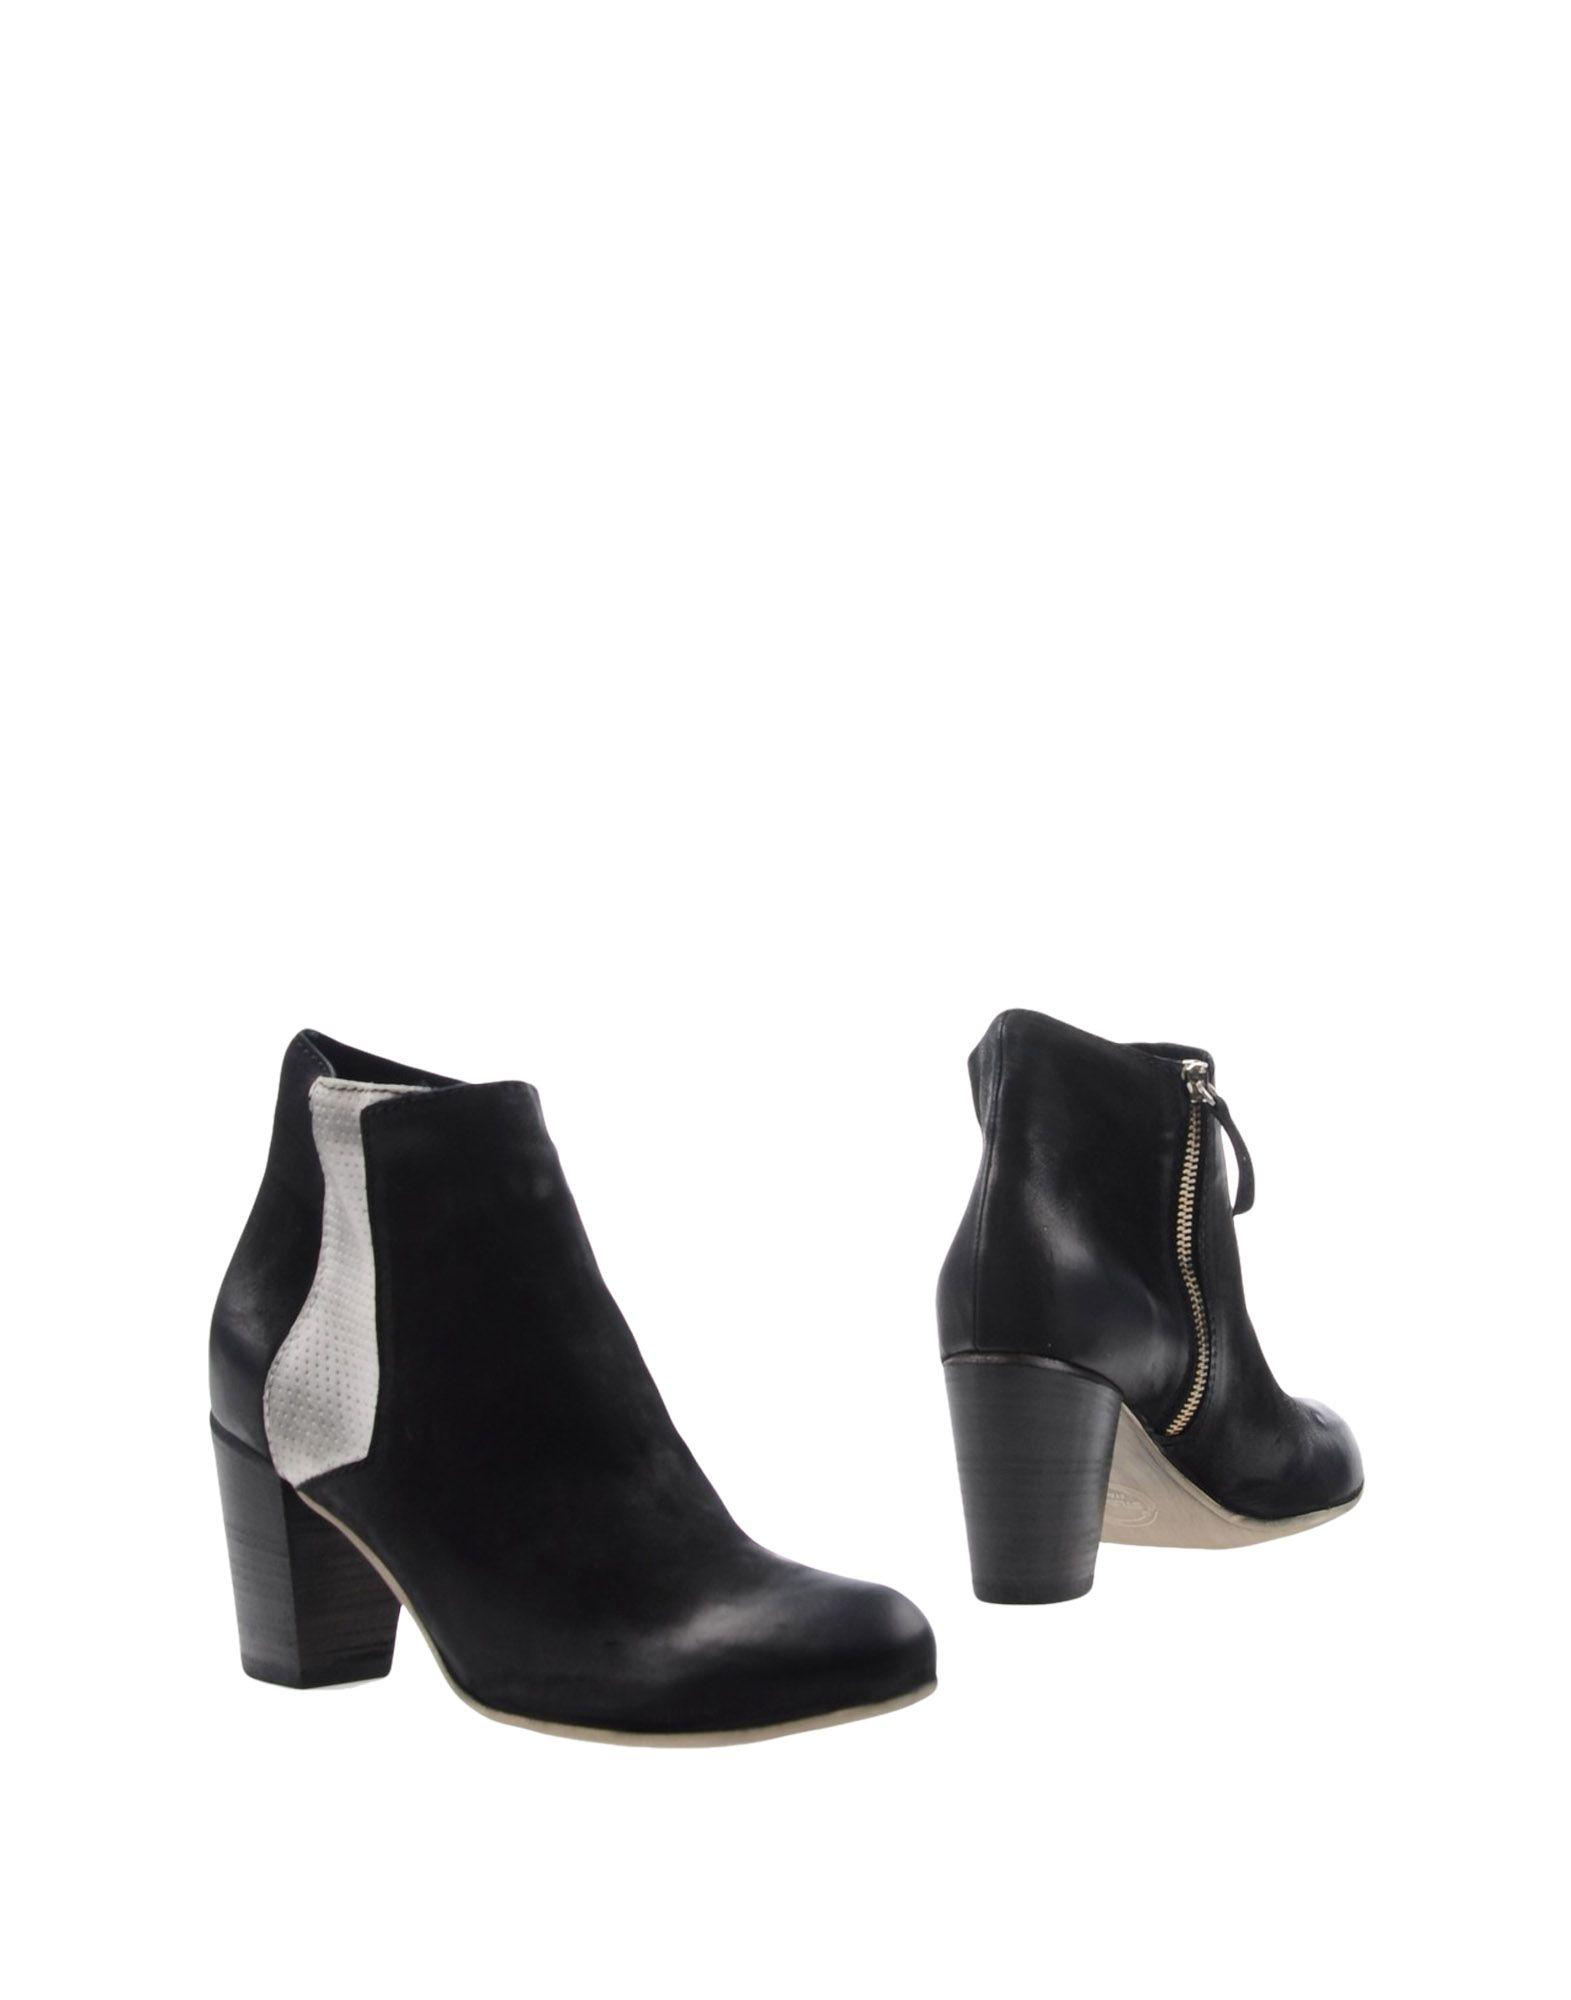 STUDIO BY VOLPATO Полусапоги и высокие ботинки si by sinela полусапоги и высокие ботинки